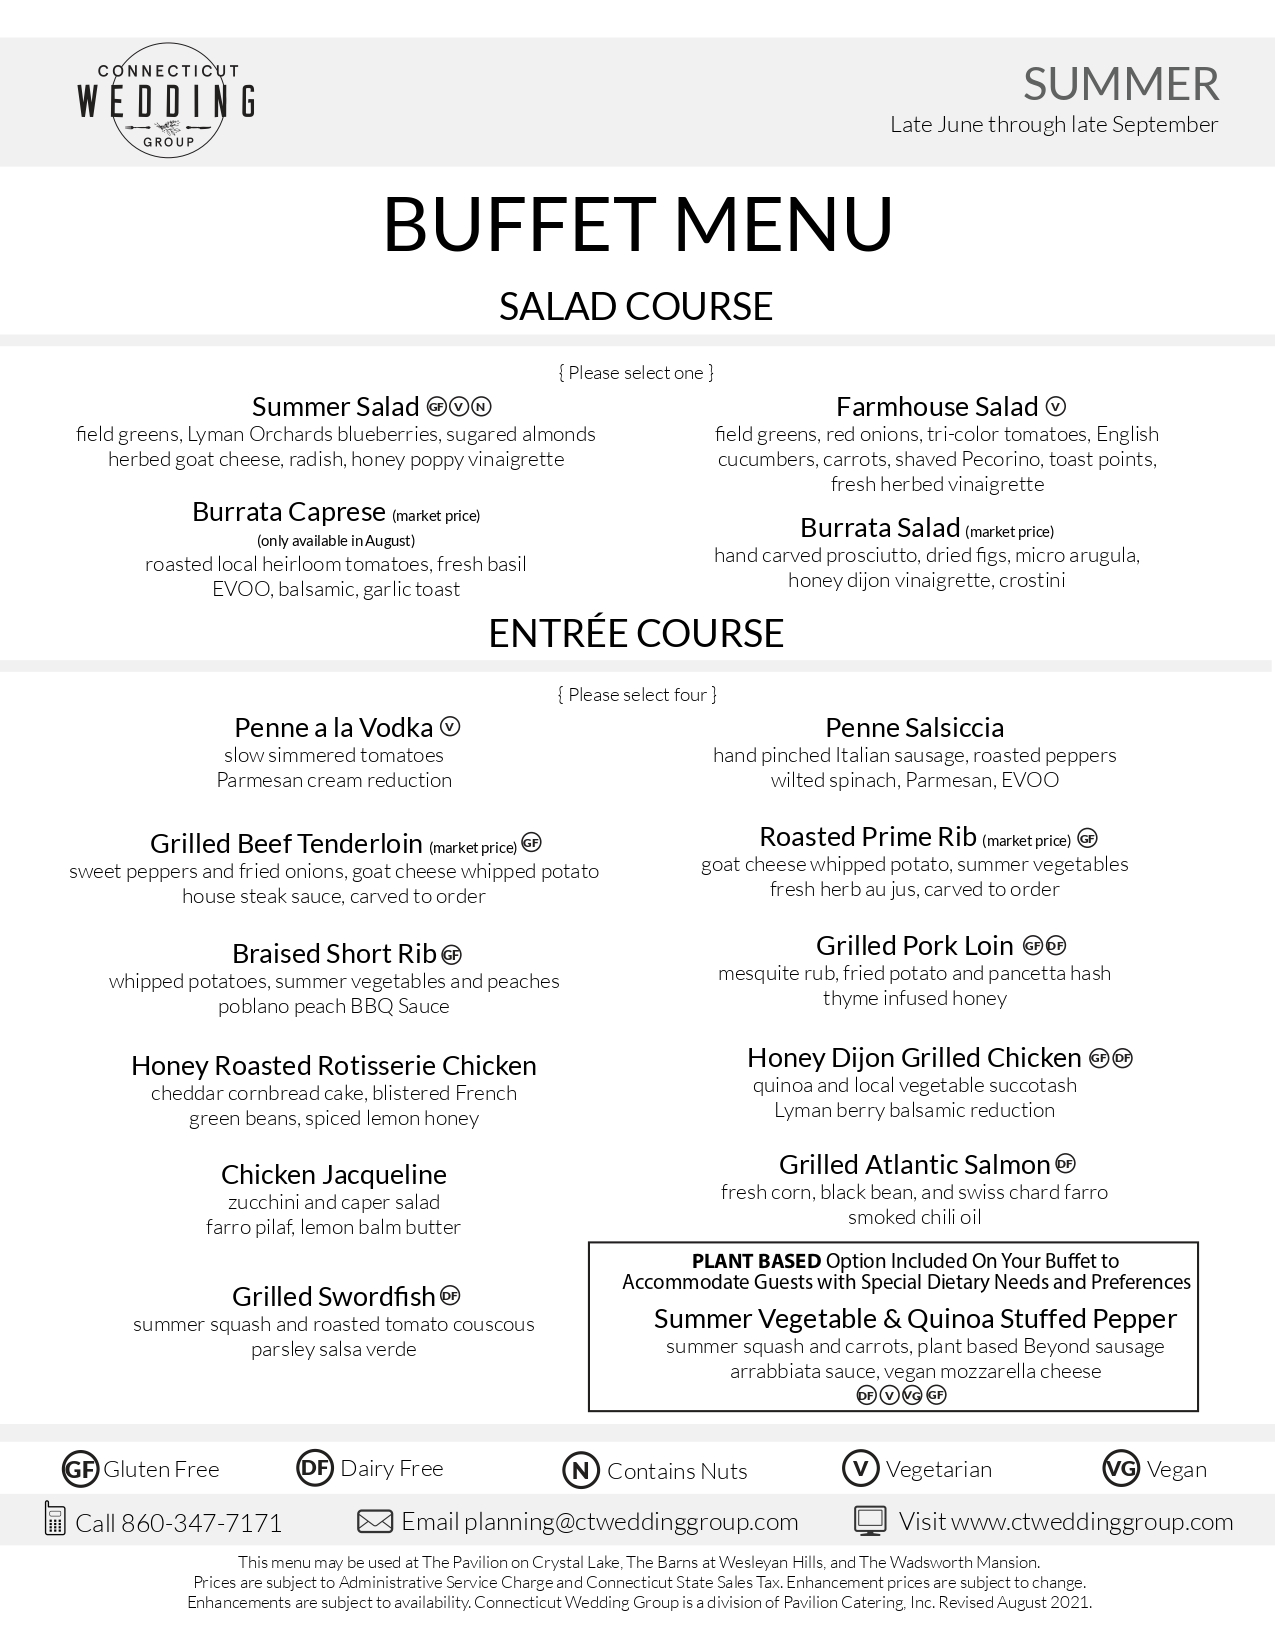 Summer-Buffet-Menu-2022_page-0001-2